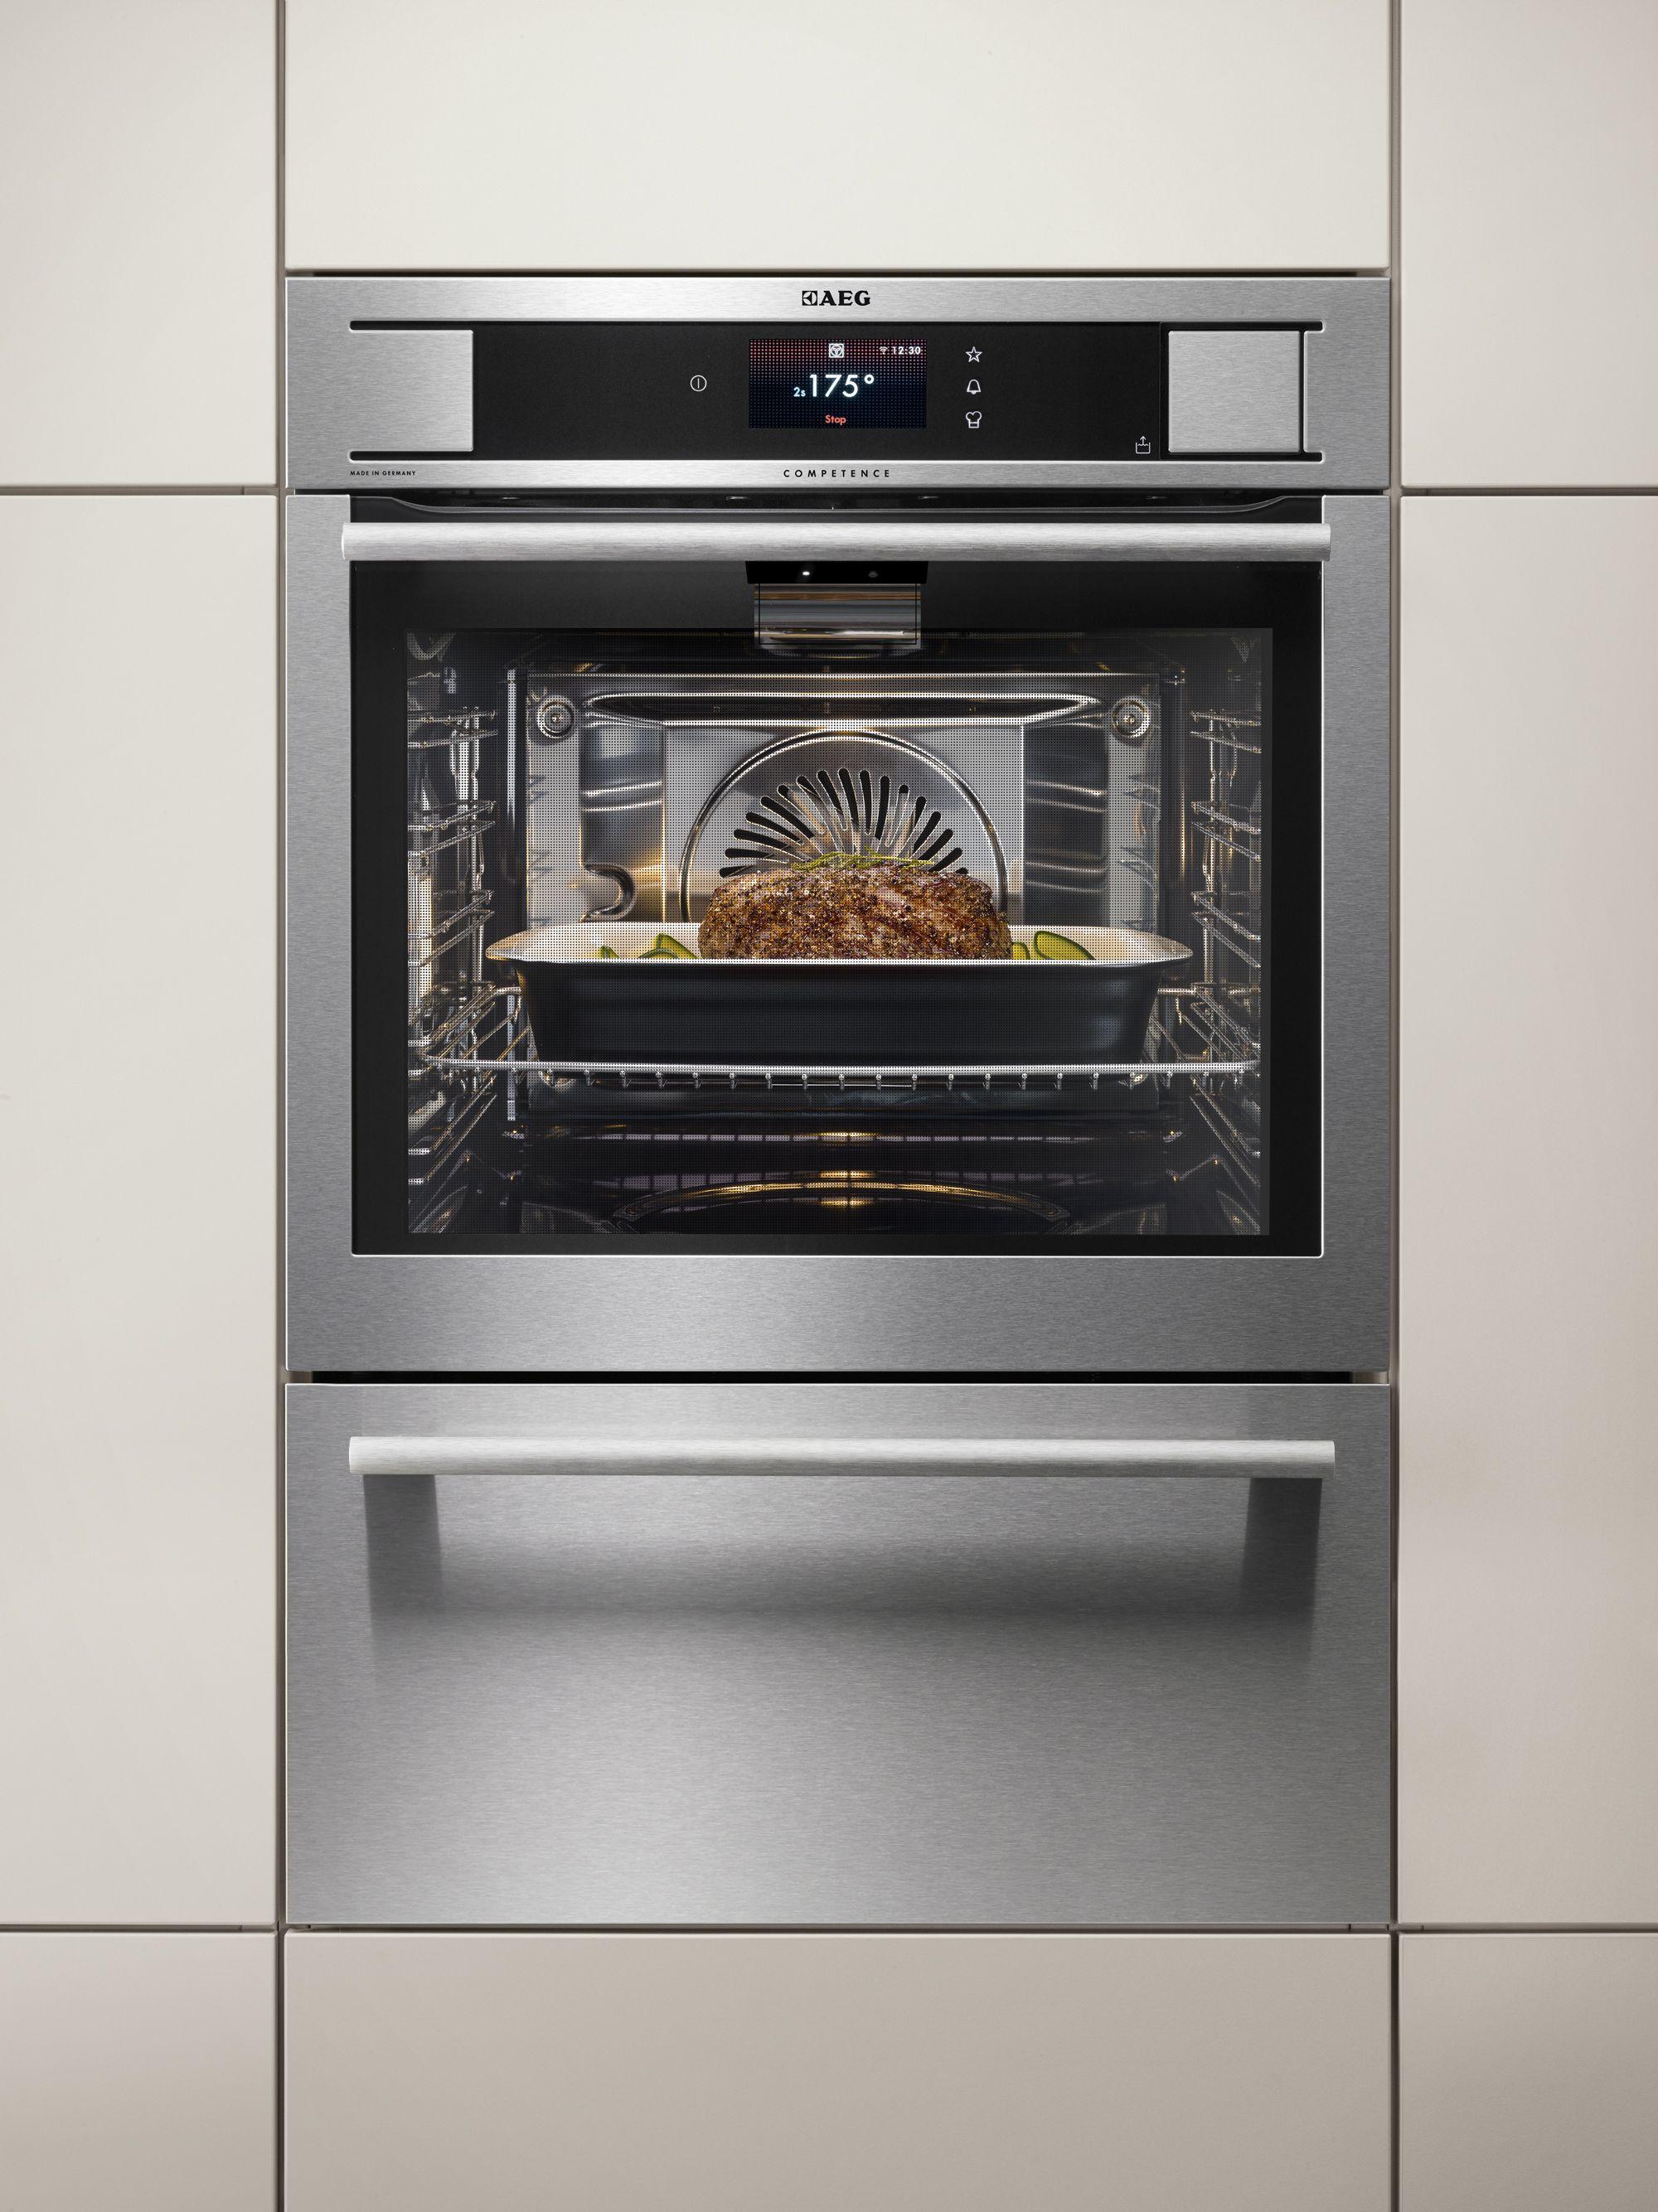 aeg procombi plus smart electrolux oven with wifi camera dream kitchen pinterest laundry